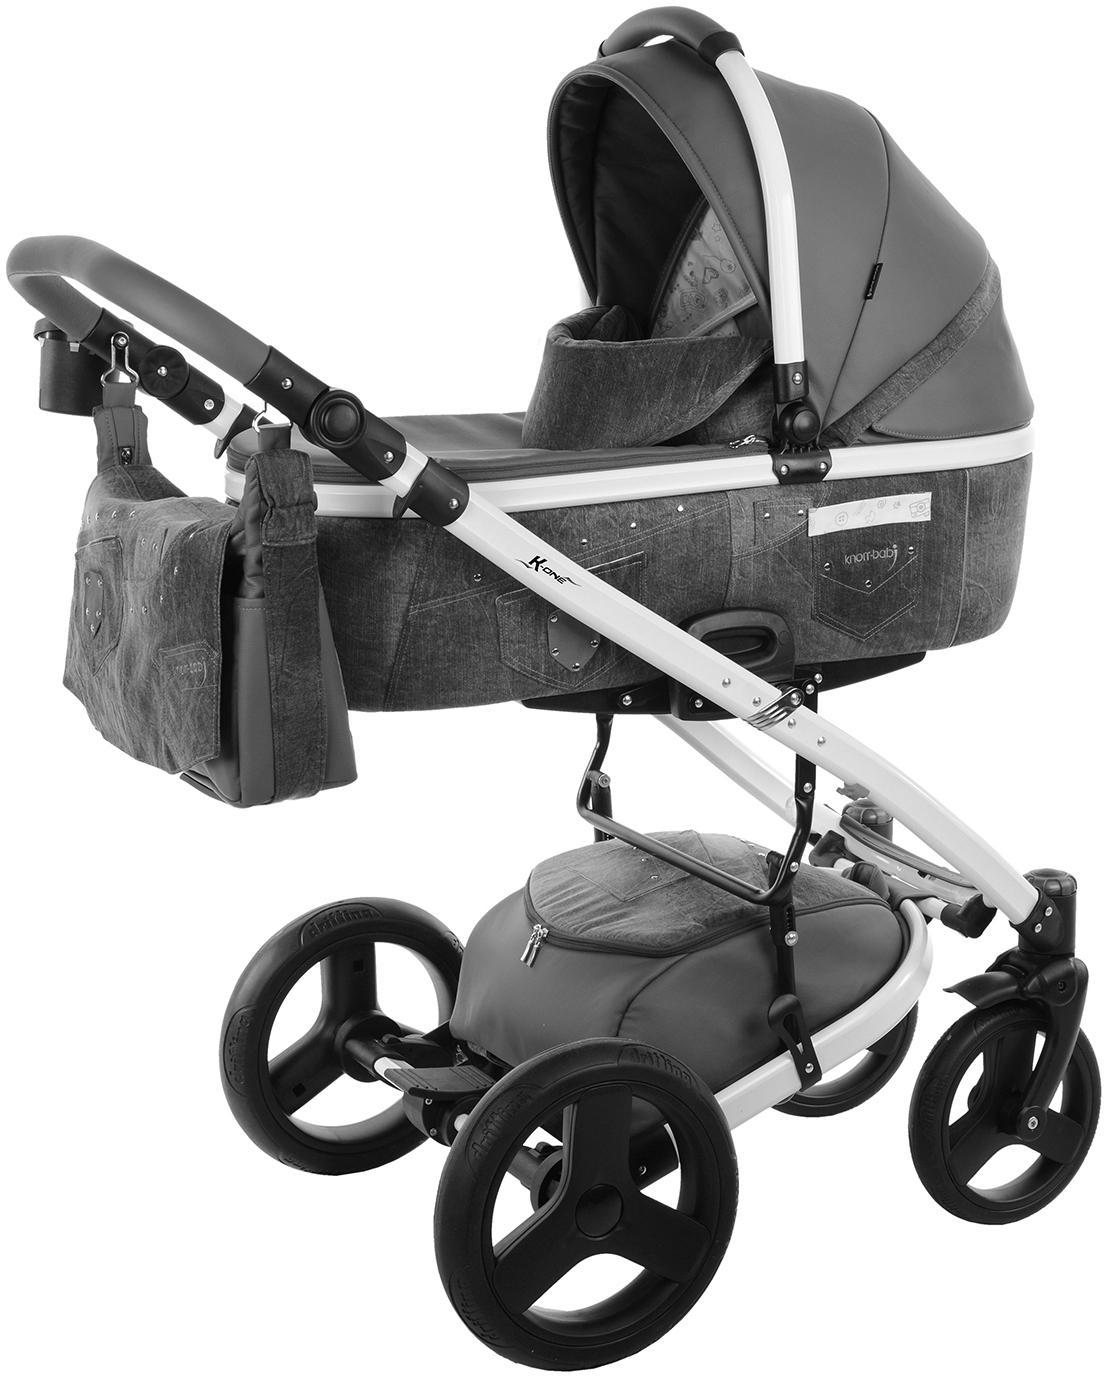 knorr-baby Kombi-Kinderwagen Set, »K-One Jeans, grey jeans« | Bekleidung > Jeans > Sonstige Jeans | Mehrfarbig | Ab | KNORR-BABY